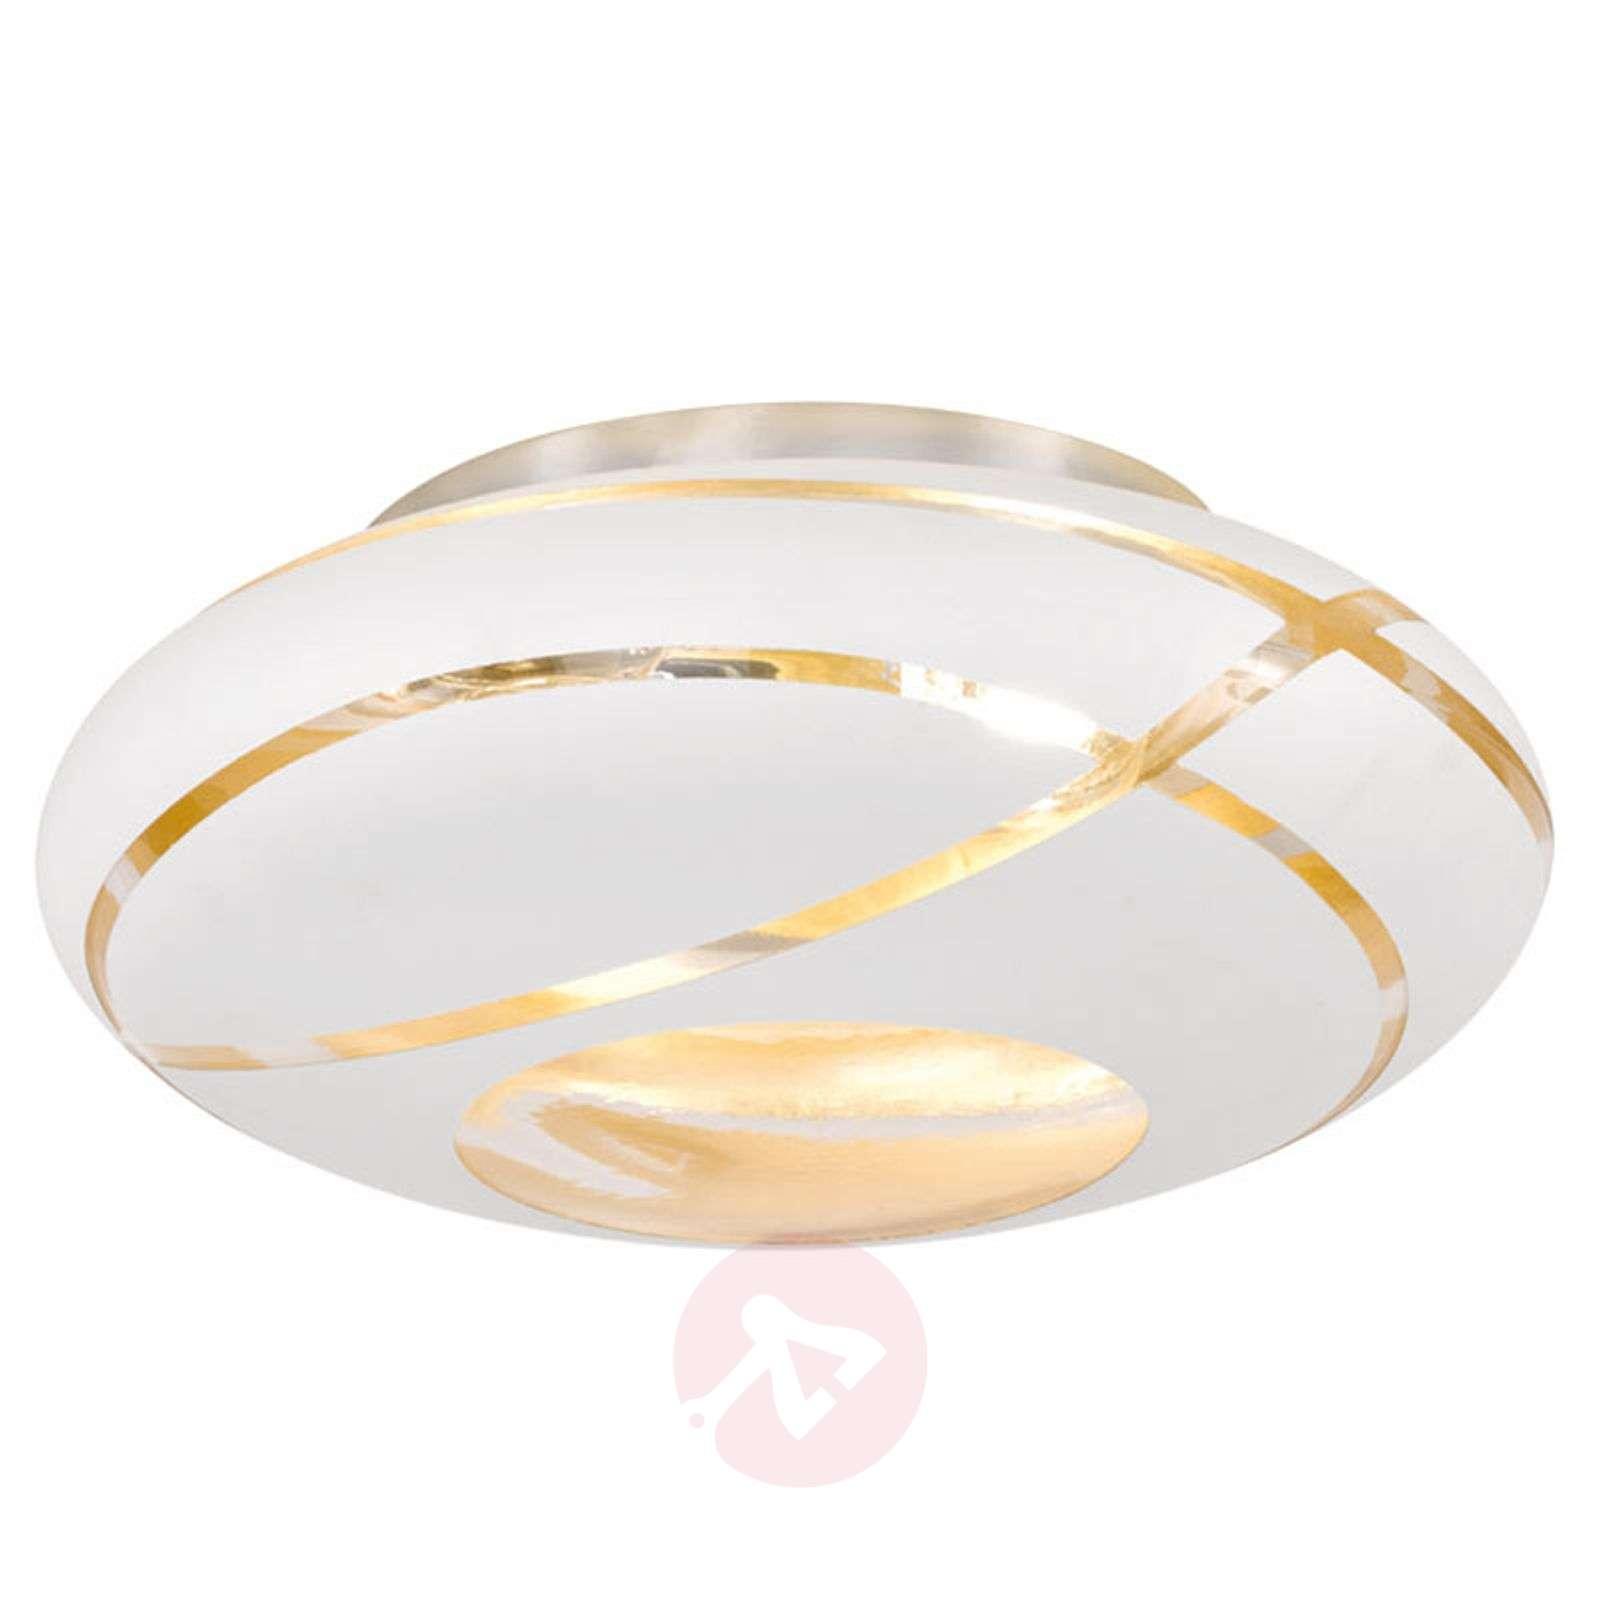 Farona glass ceiling light with golden inside-9005463-01